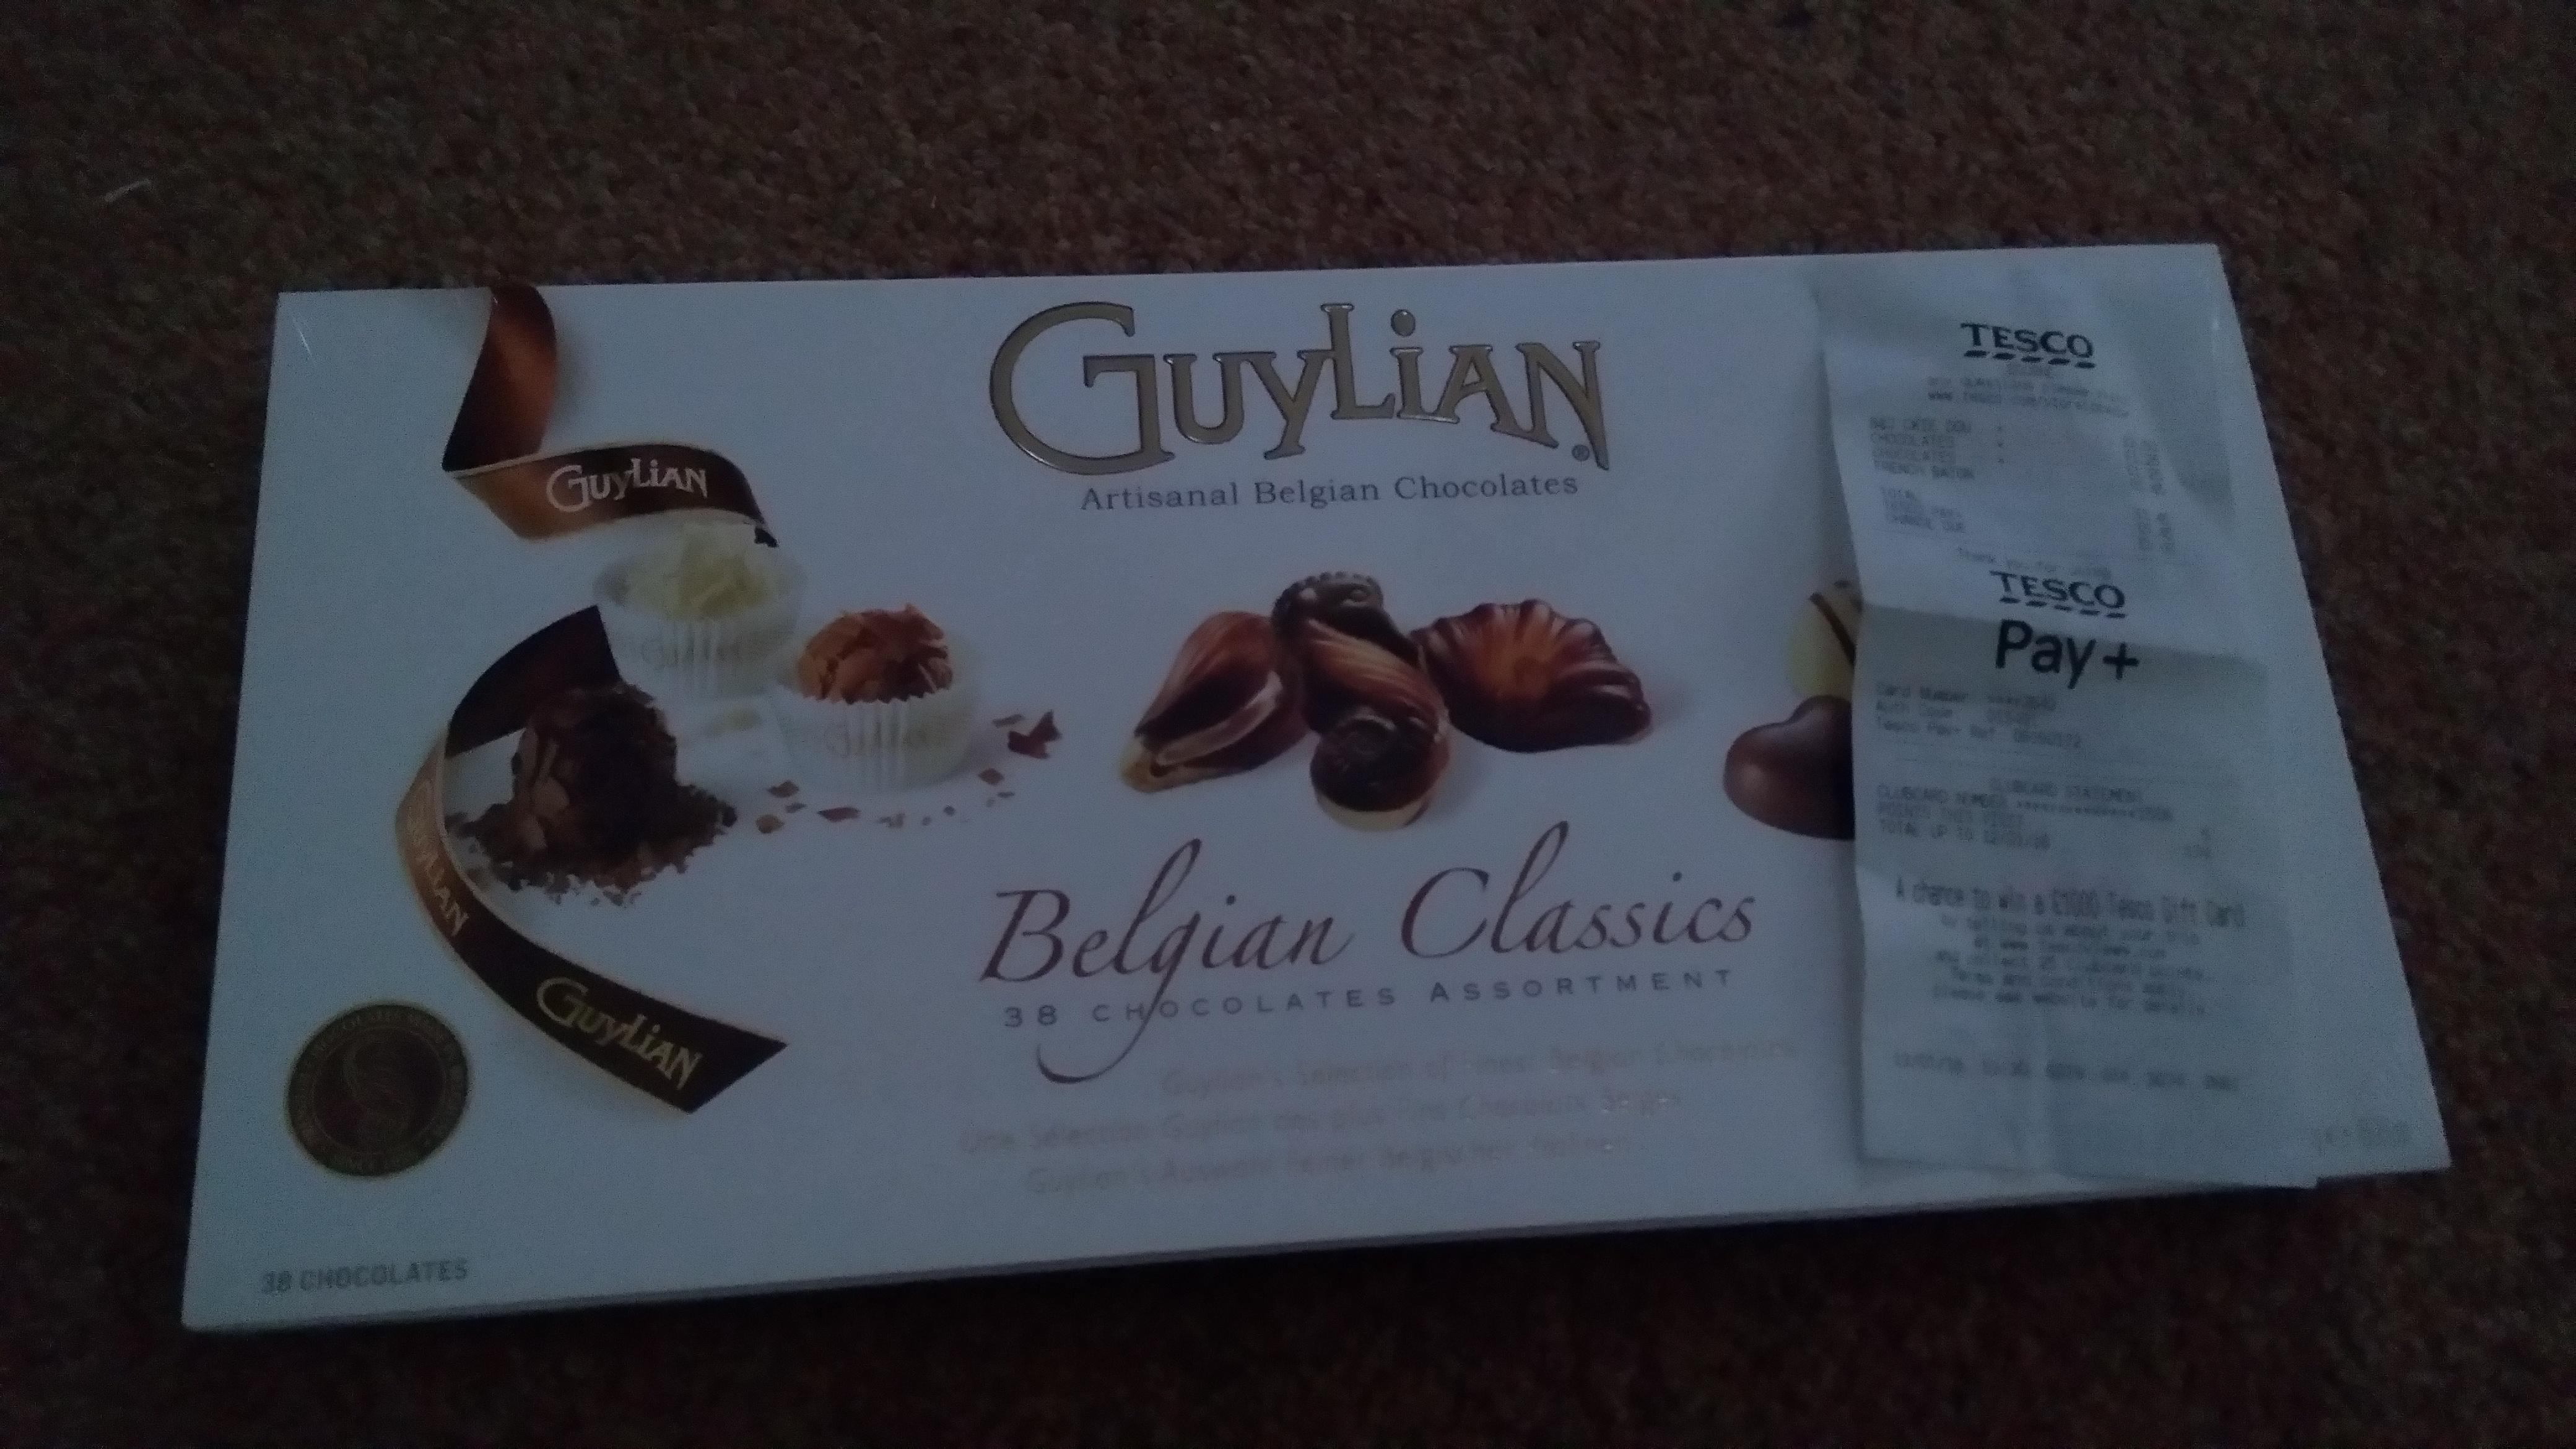 Guylian Belgian Classics Chocolates £1.25 Tesco Bourne